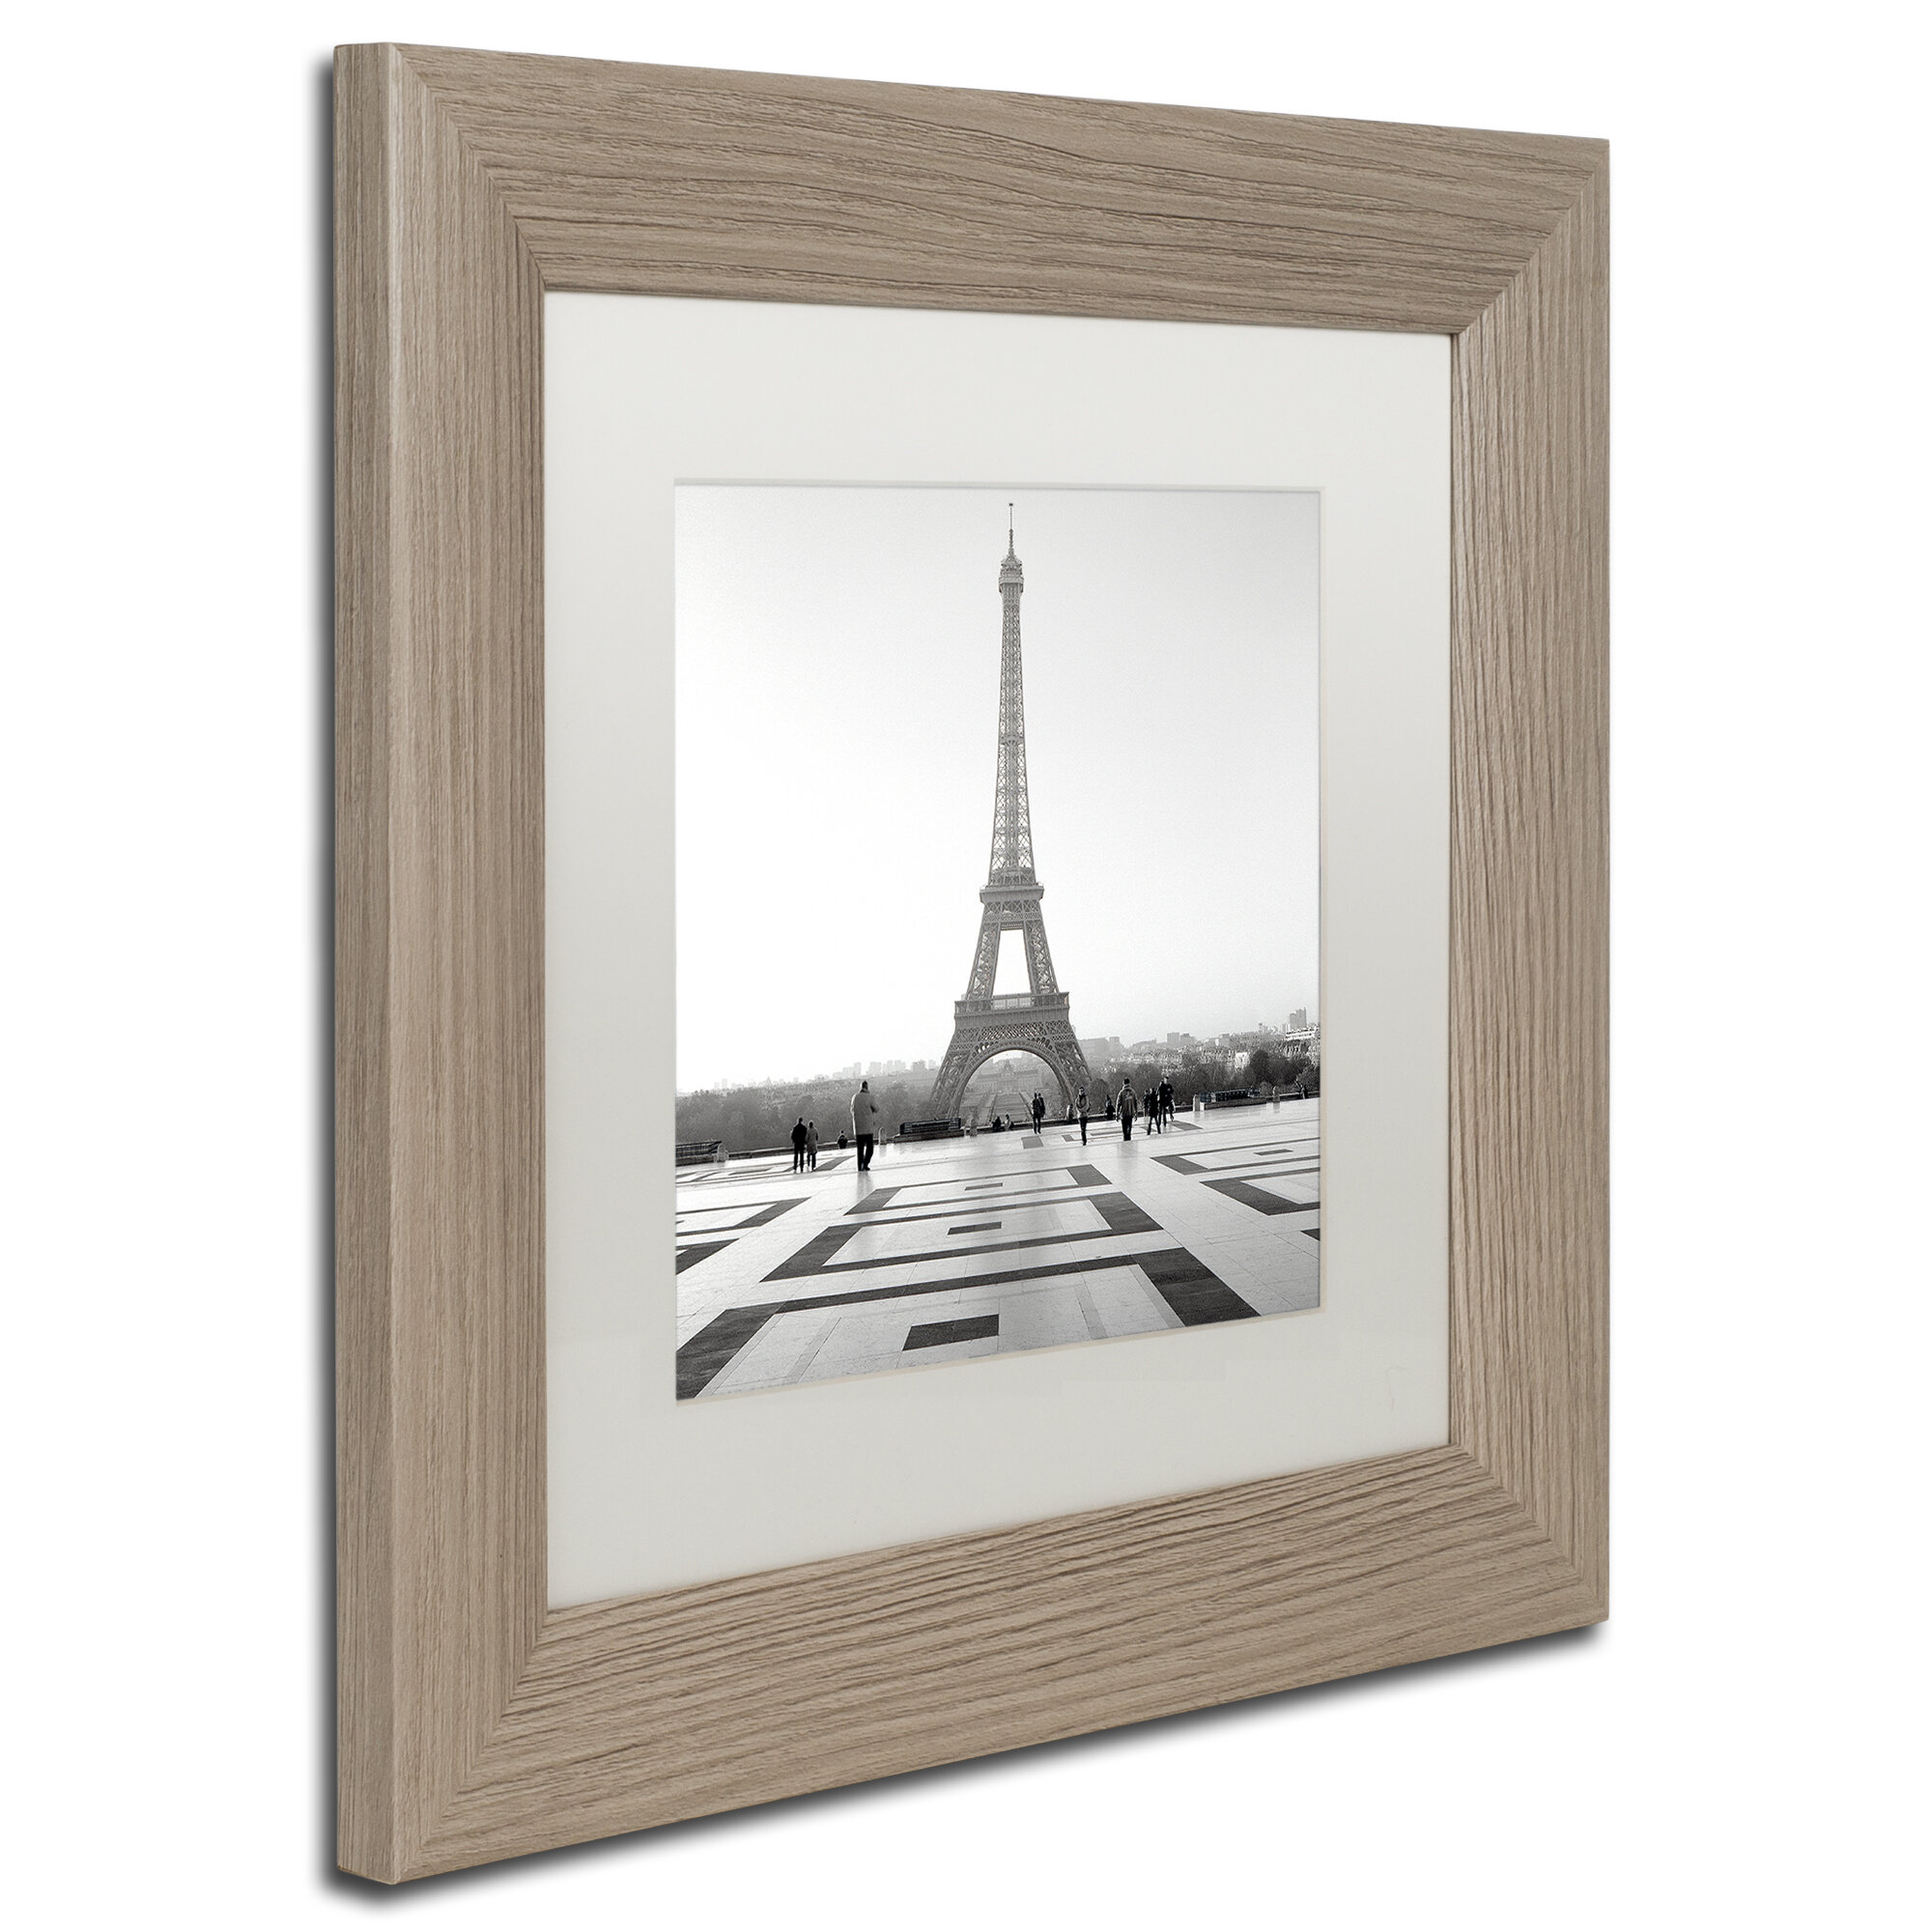 Trademark Art Venezia Xi Framed Photographic Print Wayfair